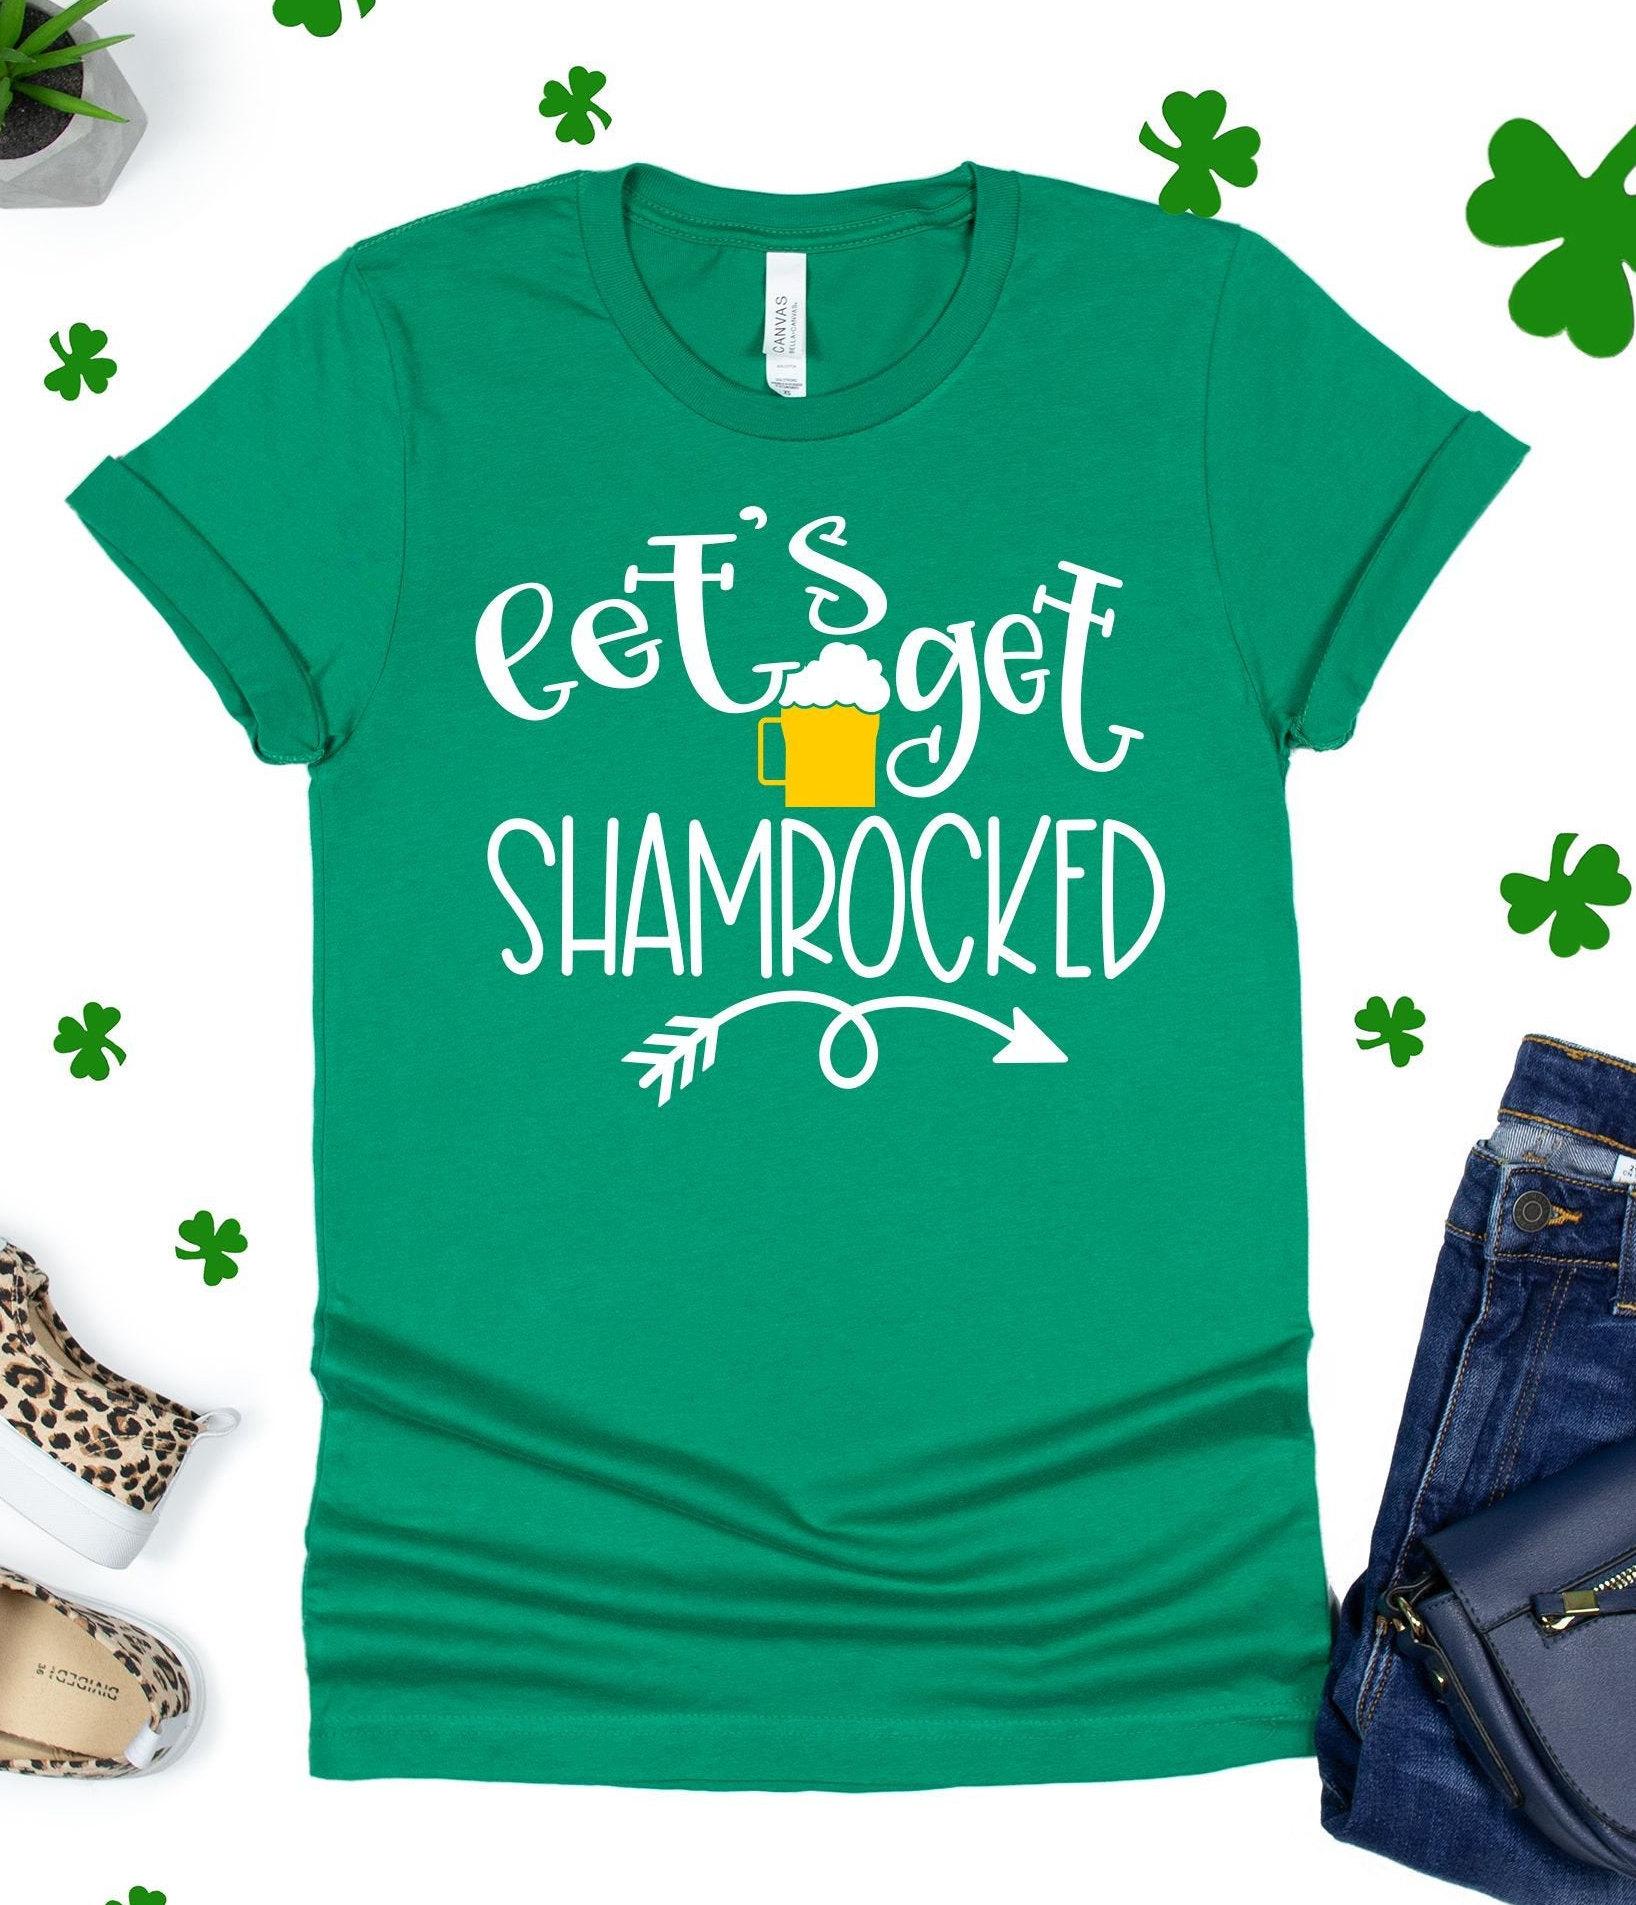 St-patricks-day-svg-lets-get-shamrocked-svg-irish-svg-beer-svg-shamrock-svg-st-patricks-day-svg-design-st-patrick-day-cut-file-cricut-60513f3c